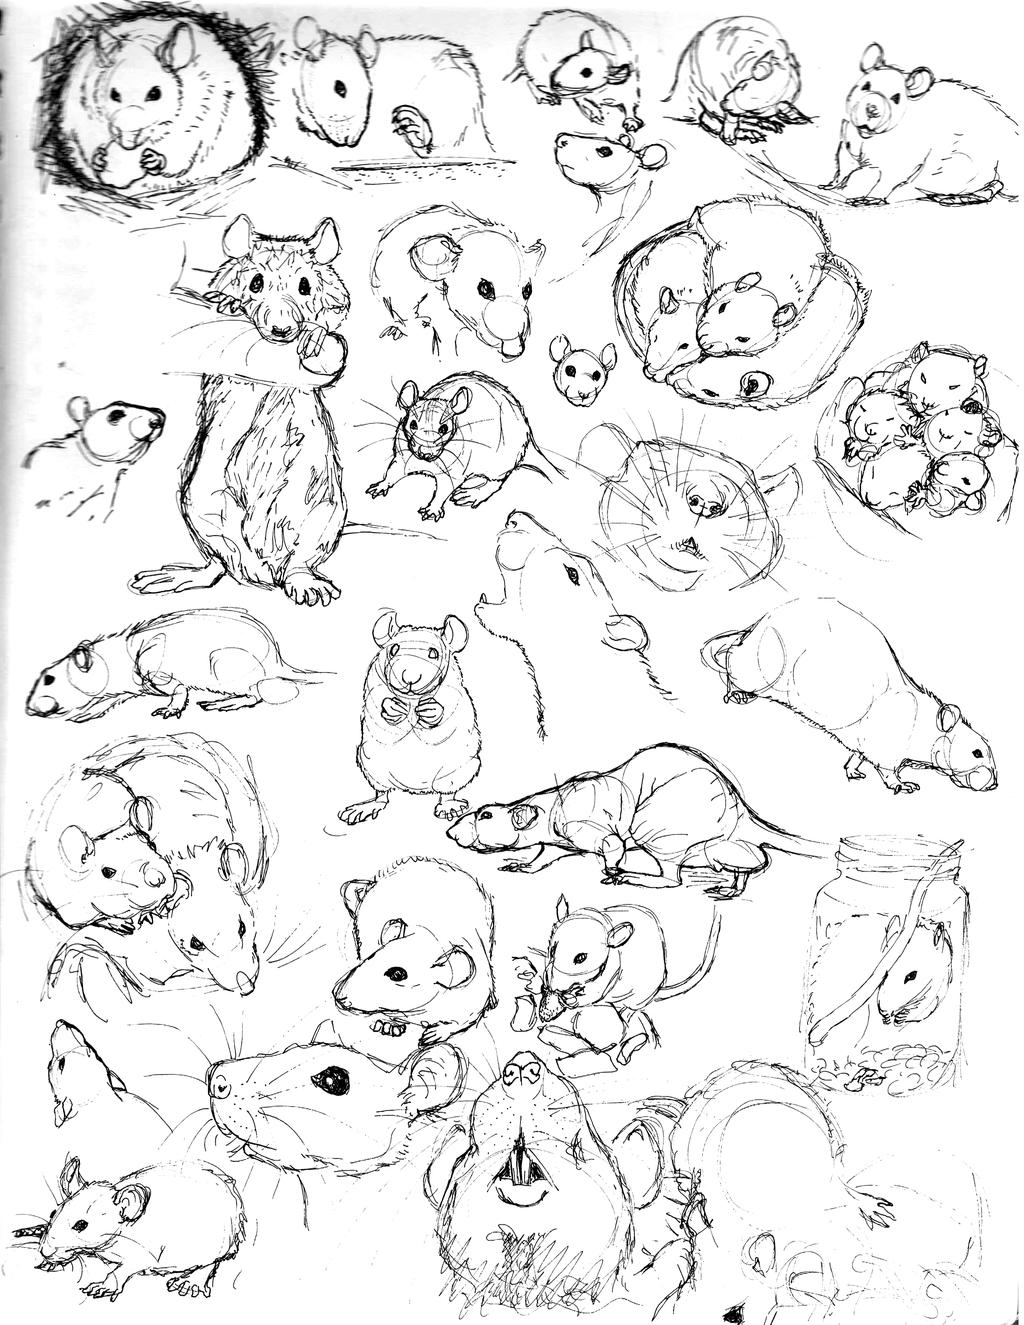 Drawn rat line drawing Com nEVEr Sketch deviantart Practice